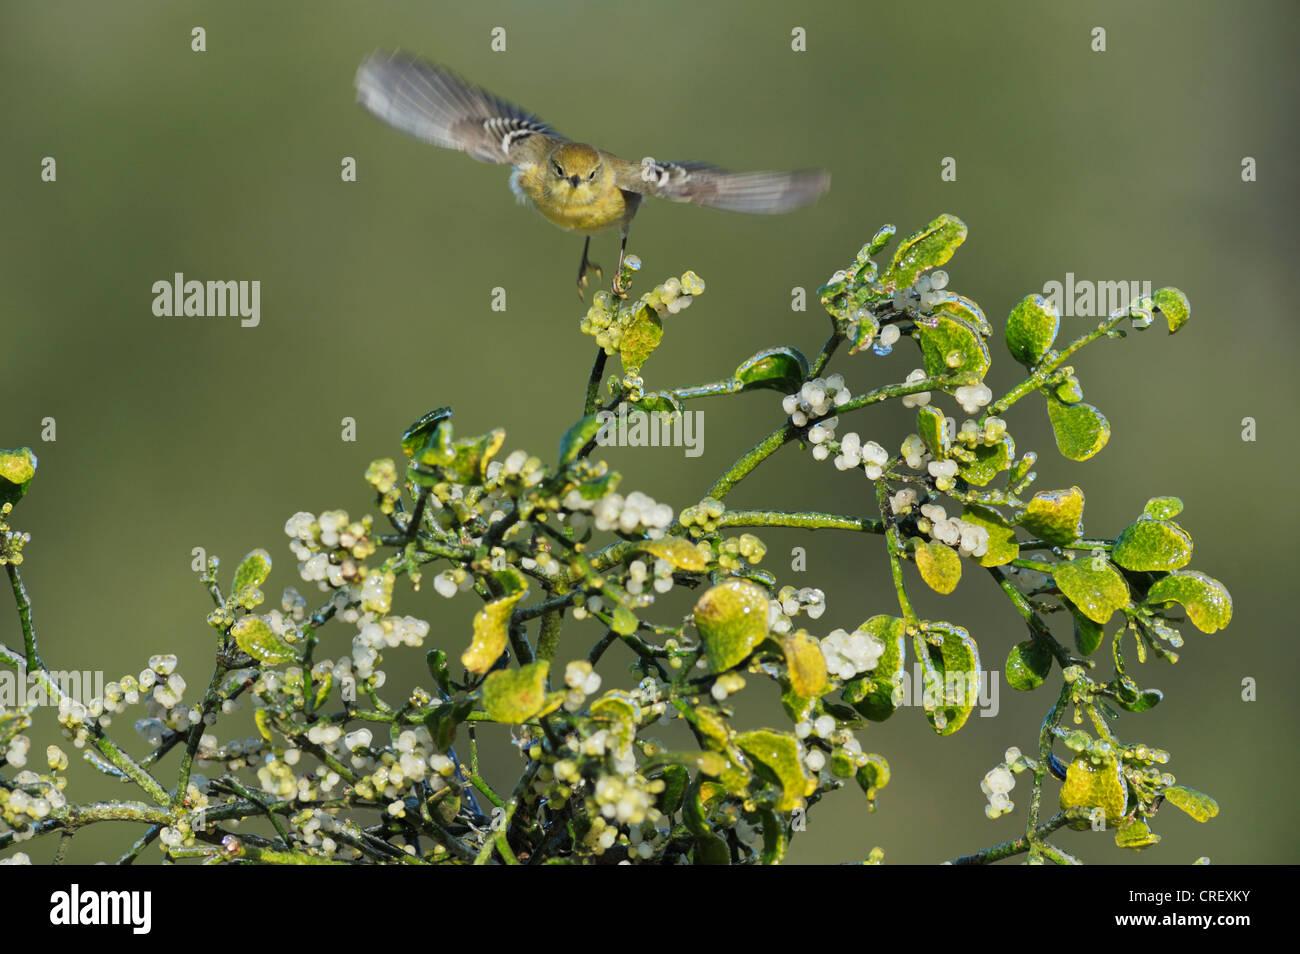 Pine Warbler (Dendroica pinus), female taking off from Christmas mistletoe (Phoradendron tomentosum), Texas Lake - Stock Image